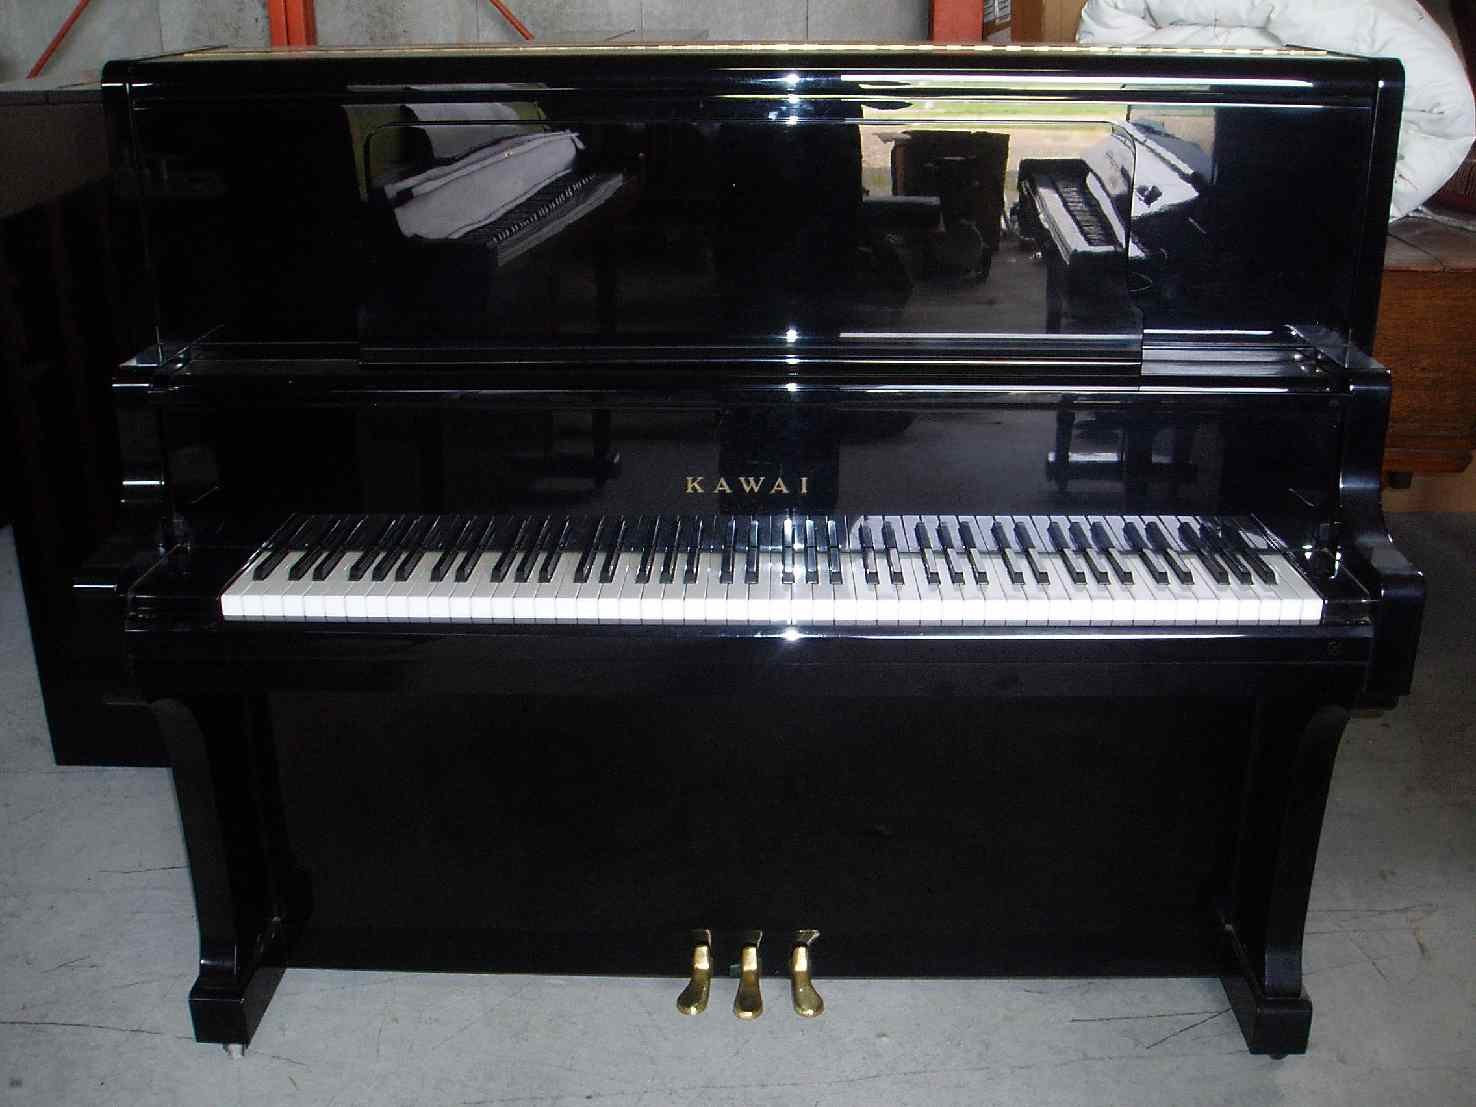 Used Piano Japanese Kawai (us50) - Buy Used Piano,Kawai,Used Kawai Product  on Alibaba com